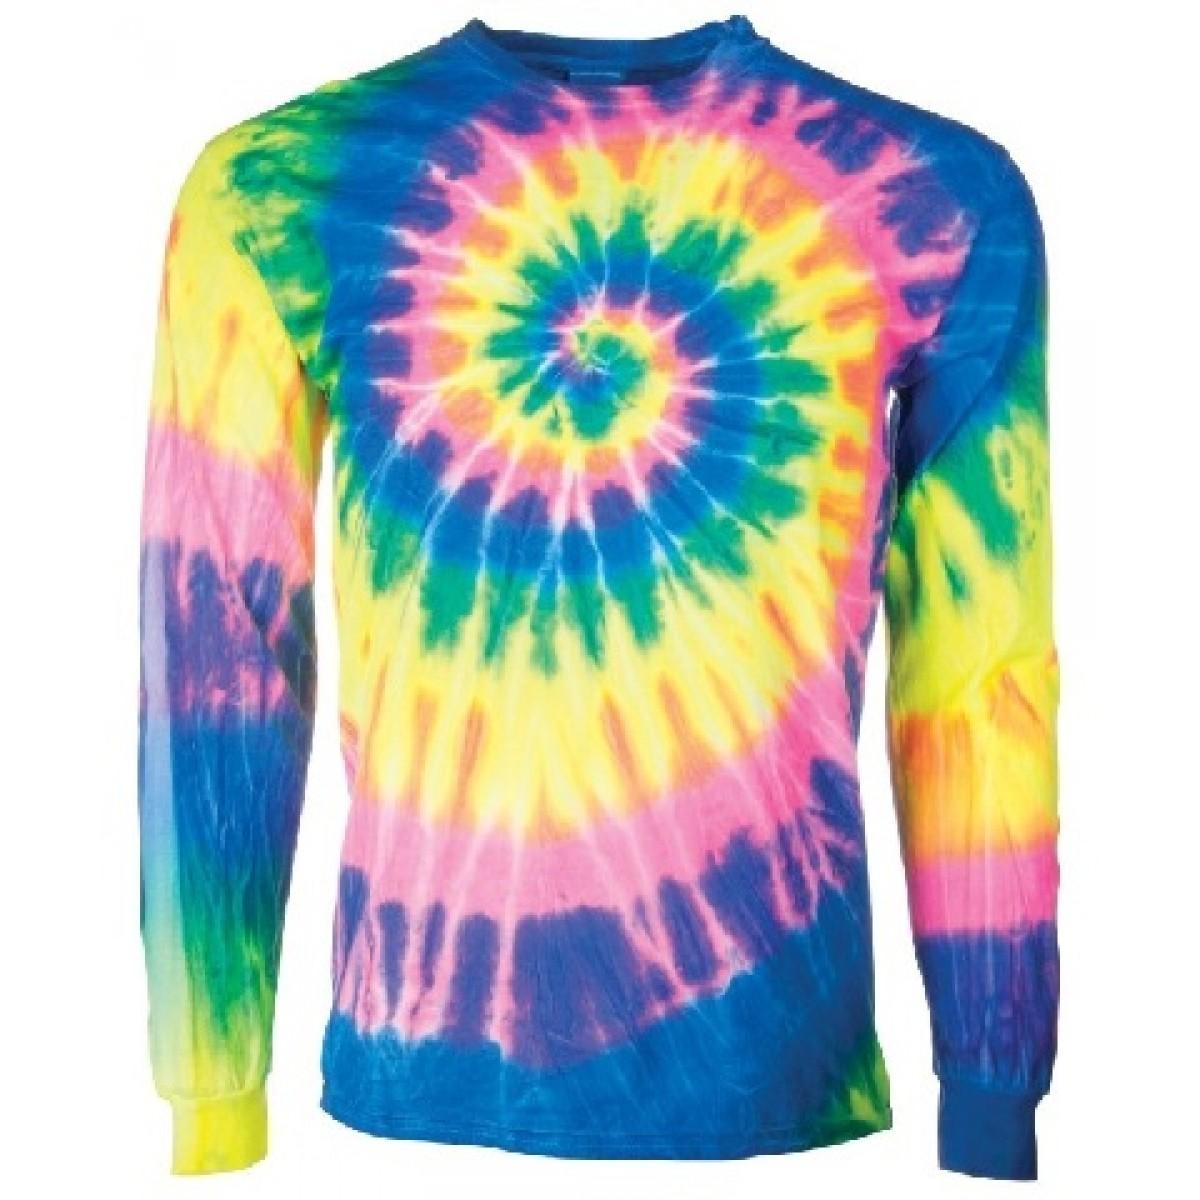 Spiral Tie Dye Long Sleeve Flo Rainbow-Rainbow-2XL